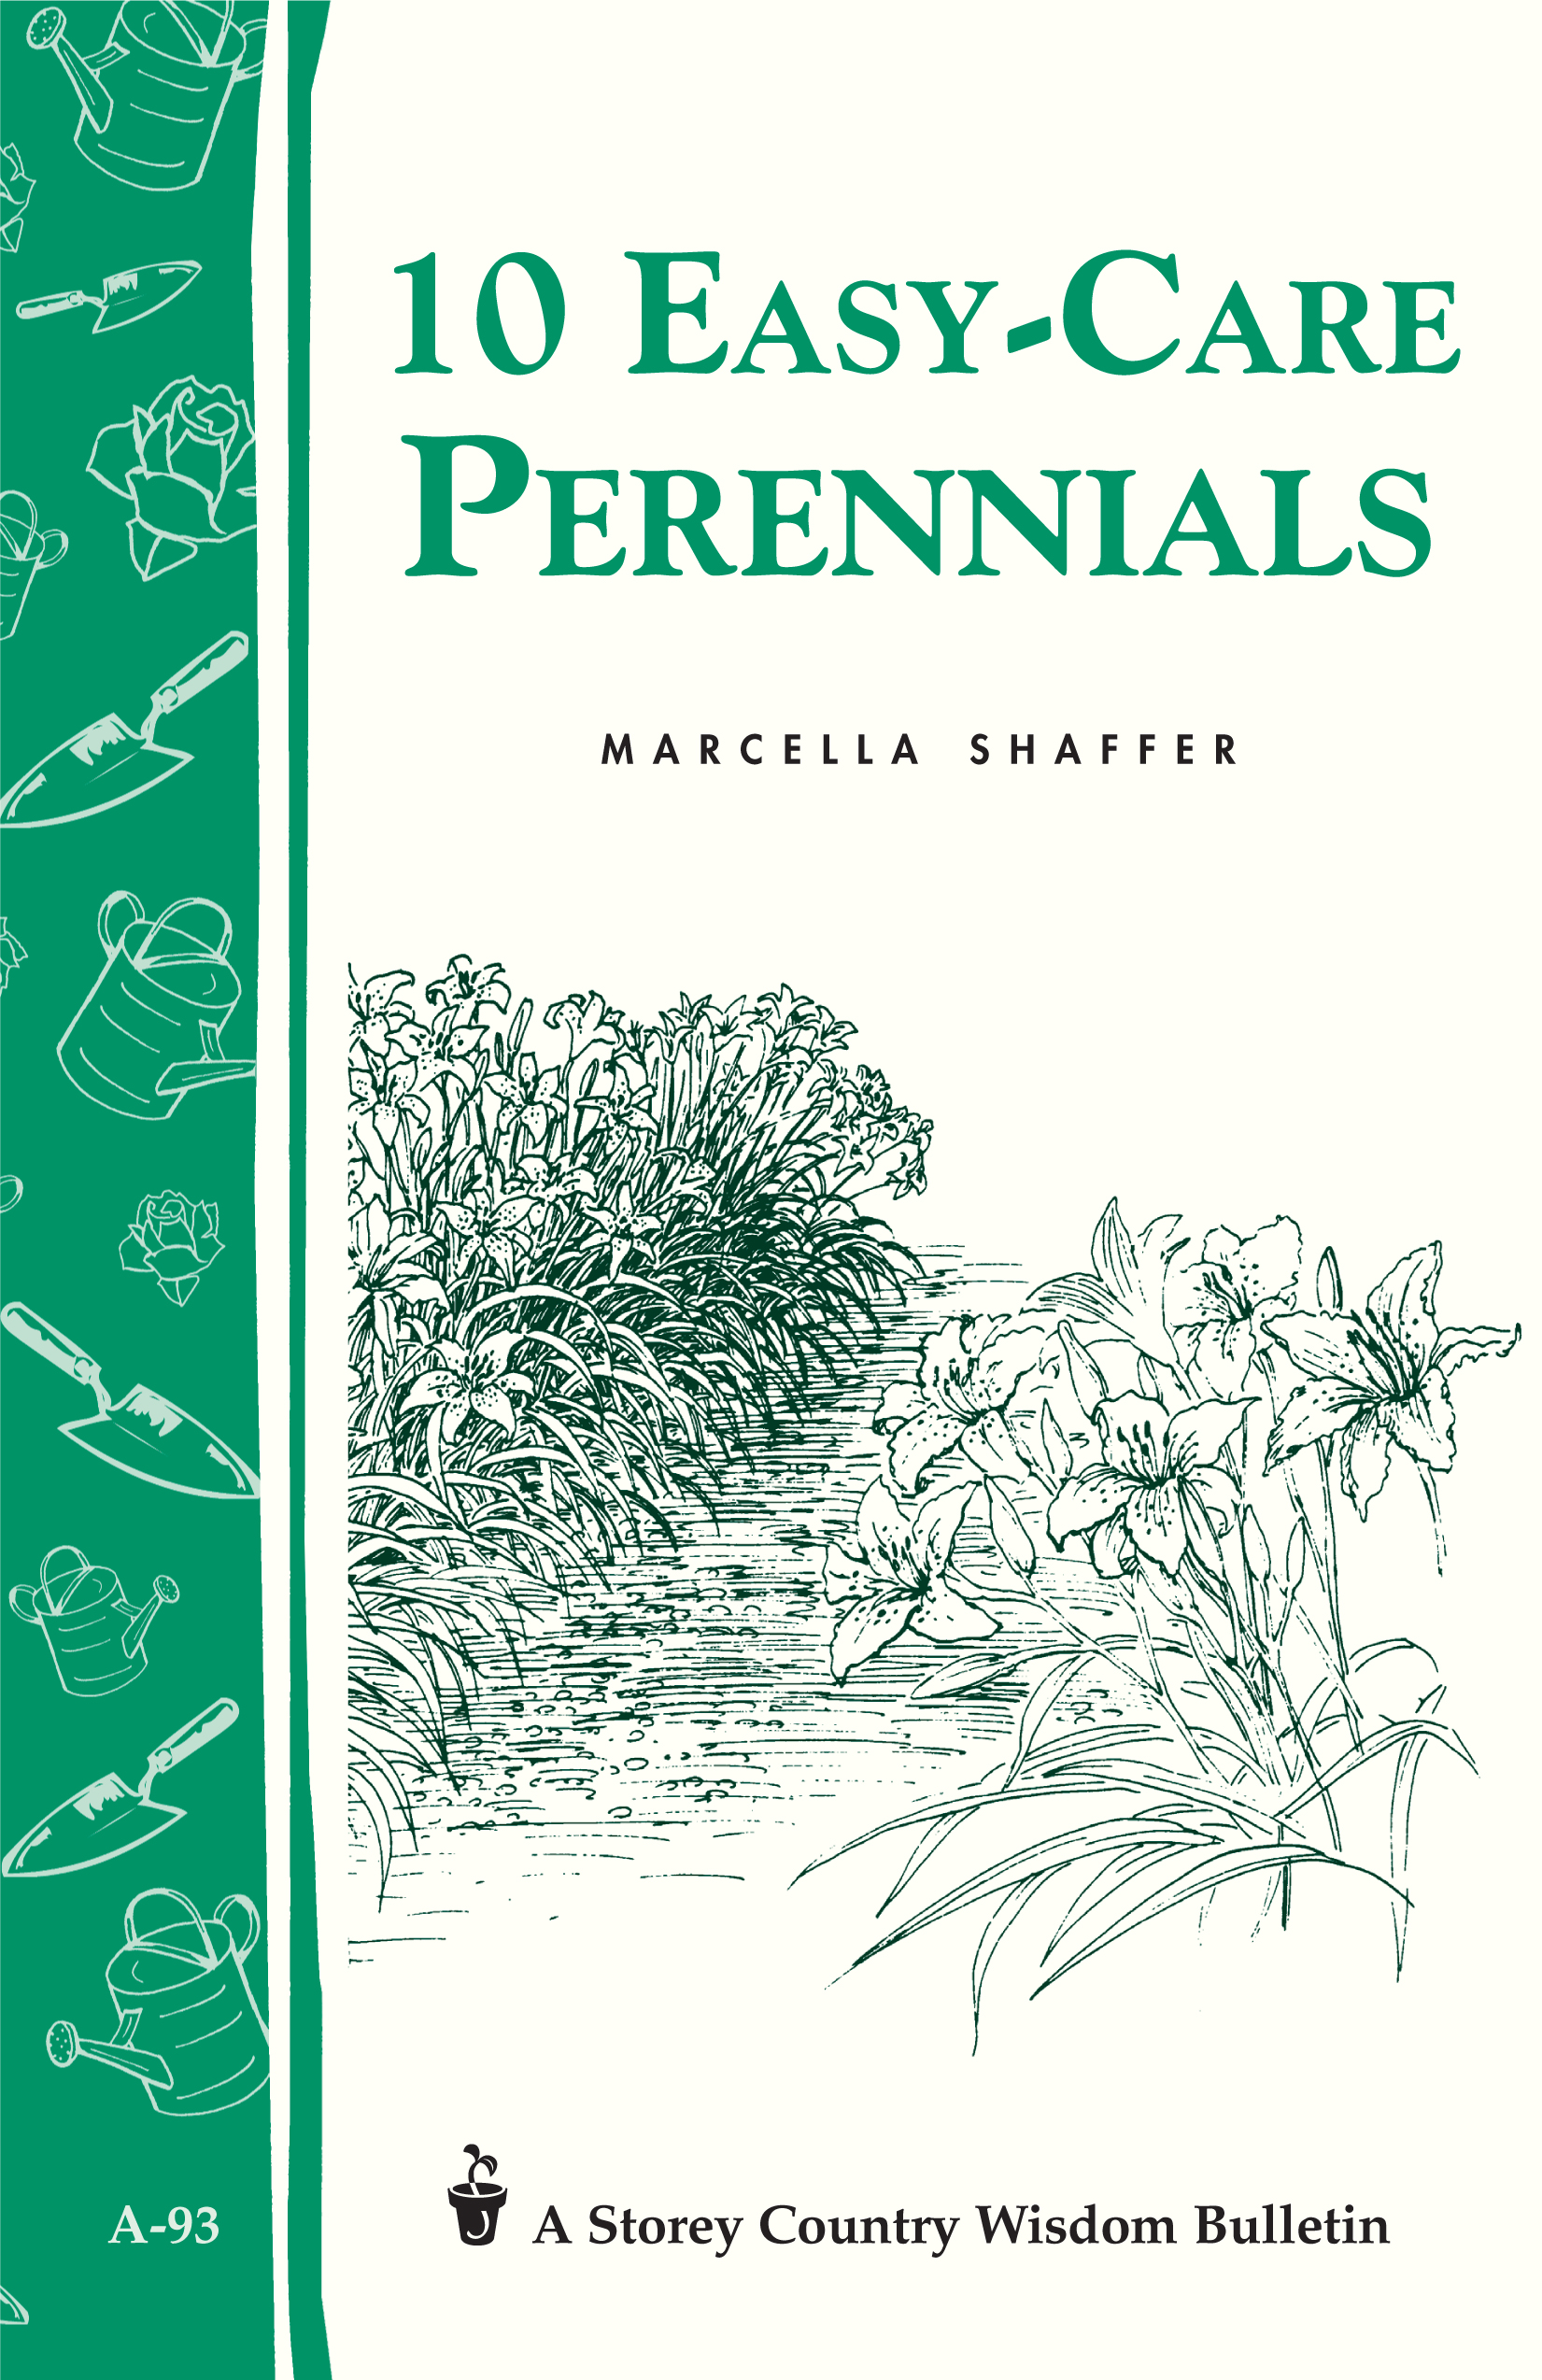 10 Easy-Care Perennials  - Marcella Shaffer